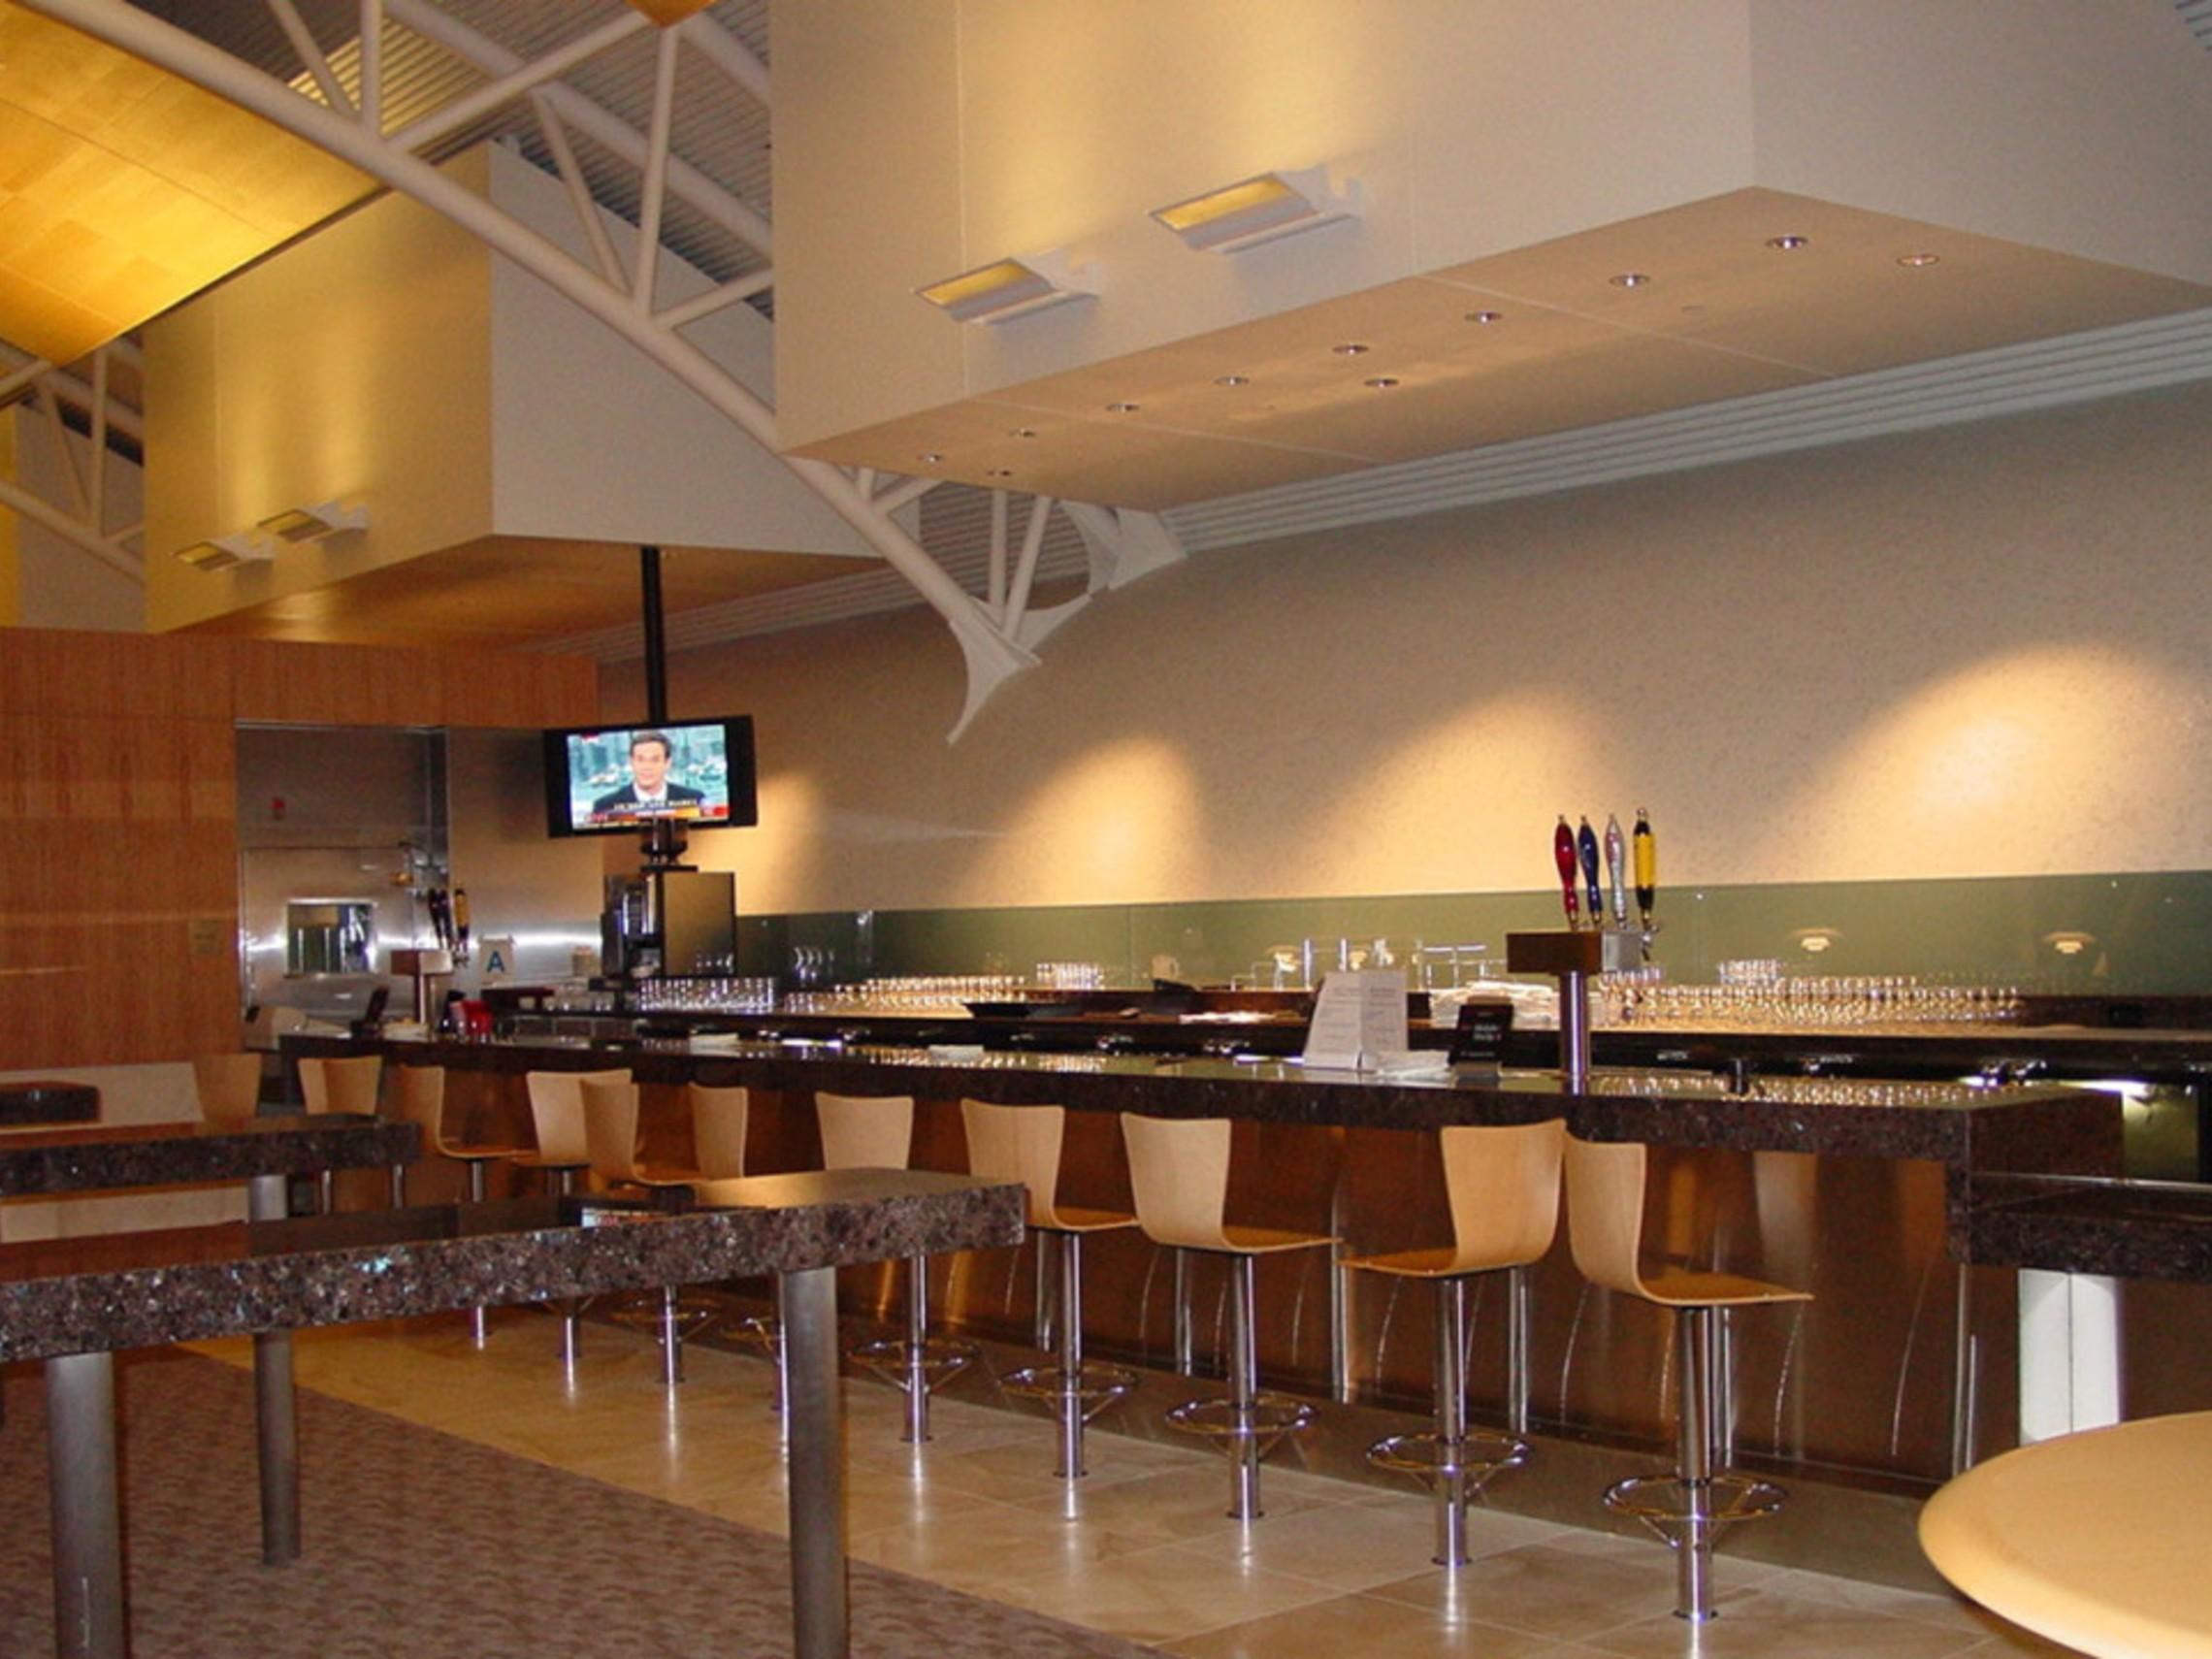 Aal Admirals Club Bar 1 1100x721